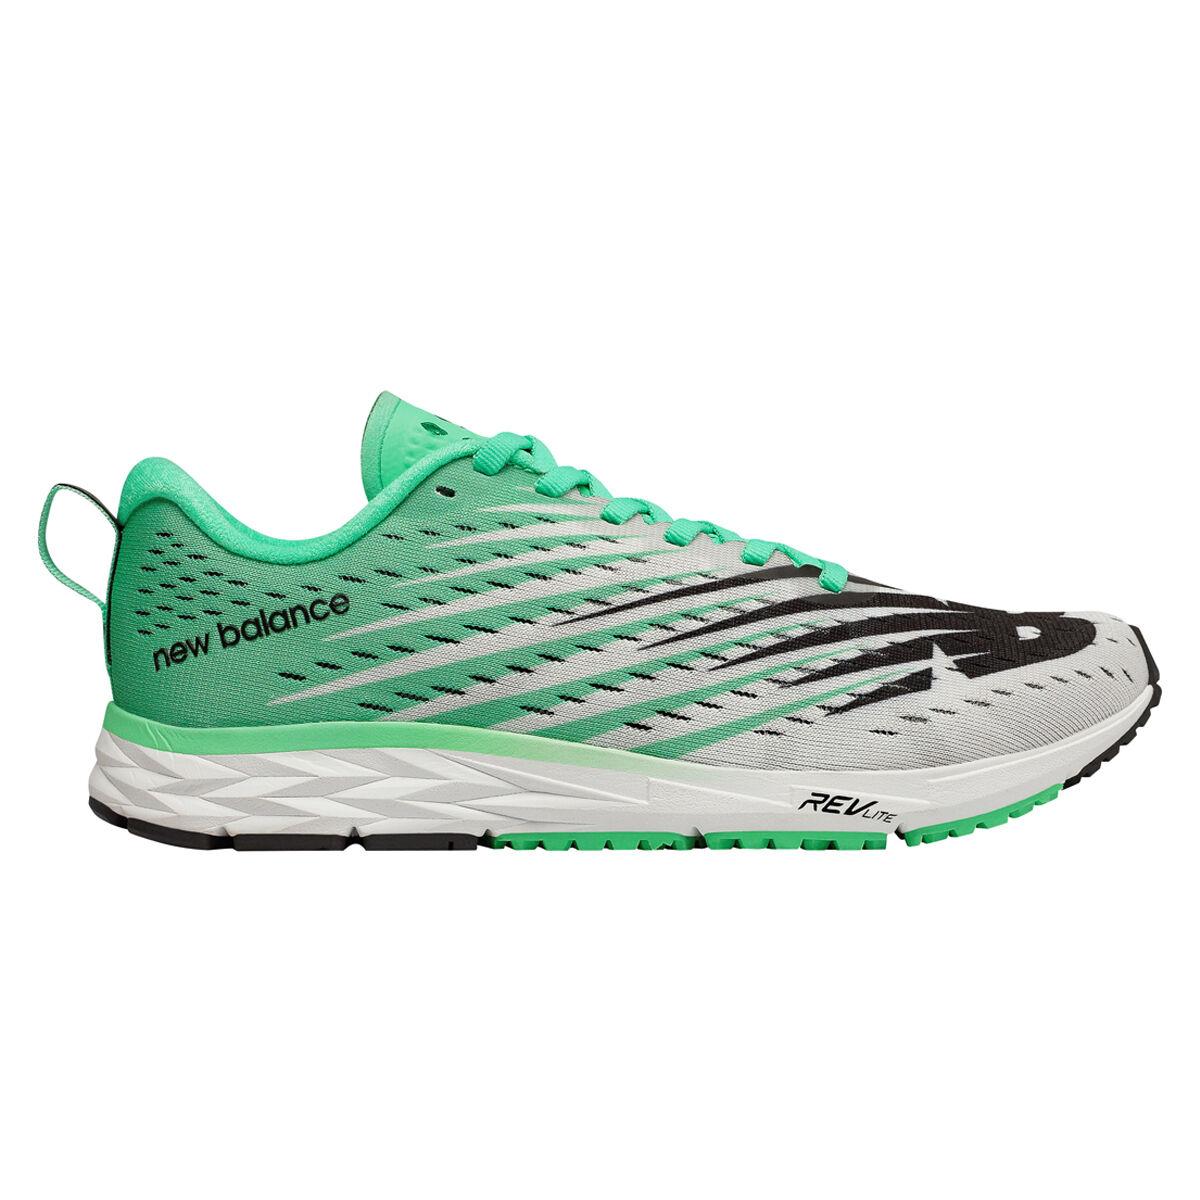 629832 402 Nike Free 5.0 TR Fit 4 Printed Ladies Running Shoes Purple